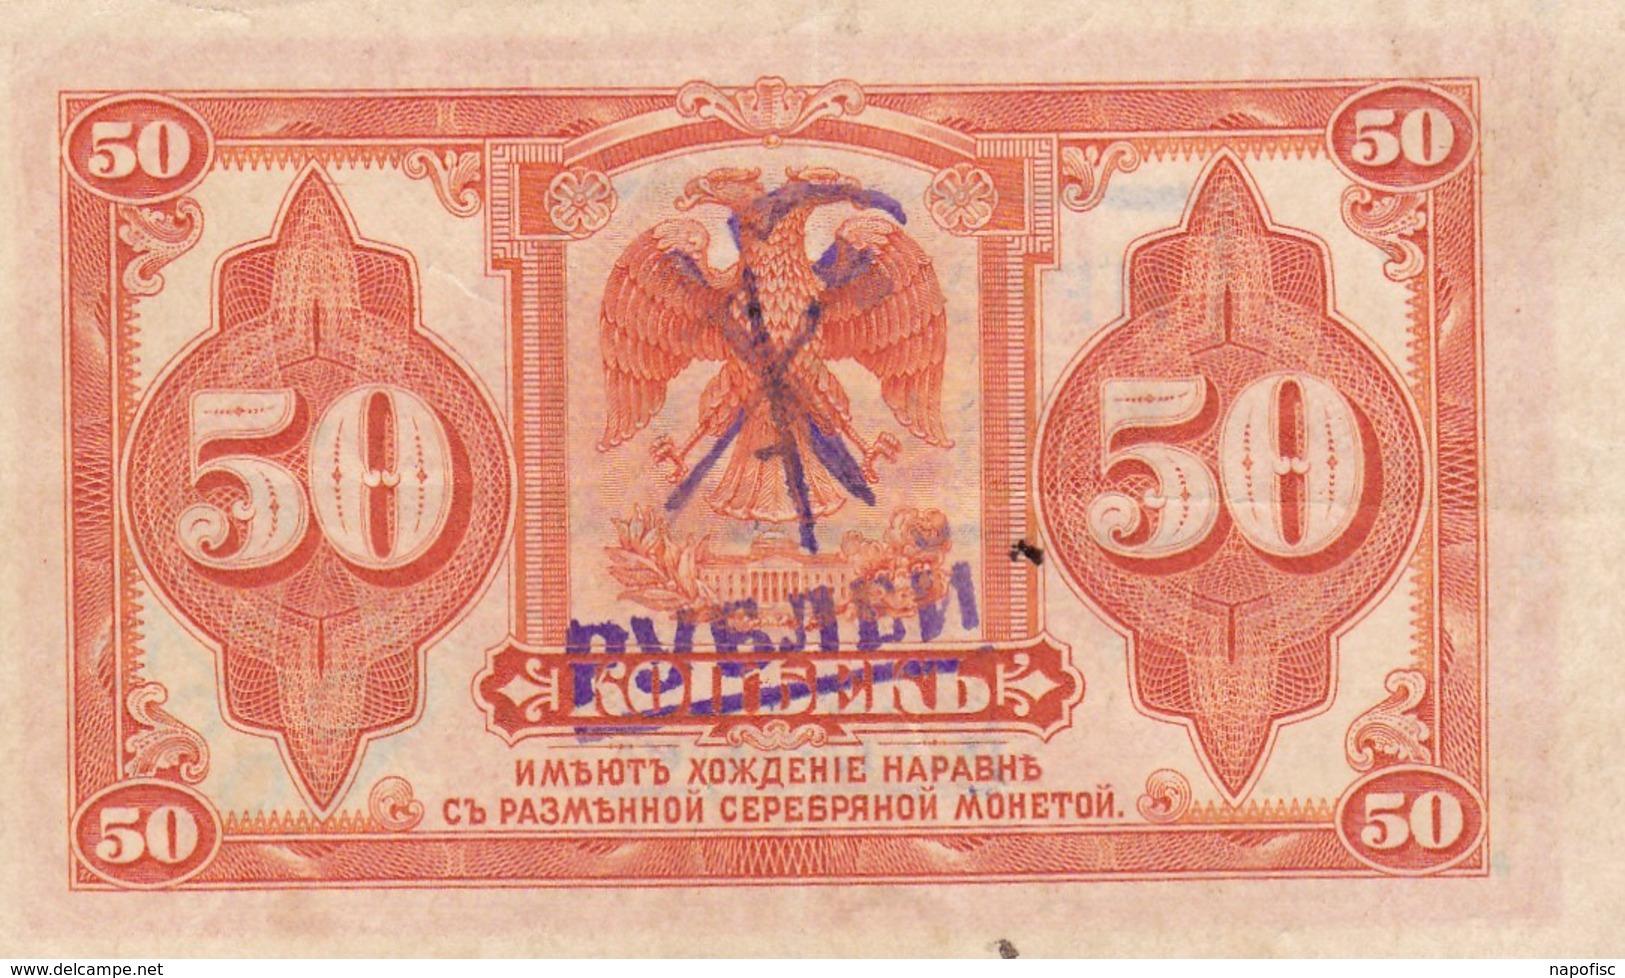 Russie - 50 Kopek Surchargé 50 Roubles - Russie